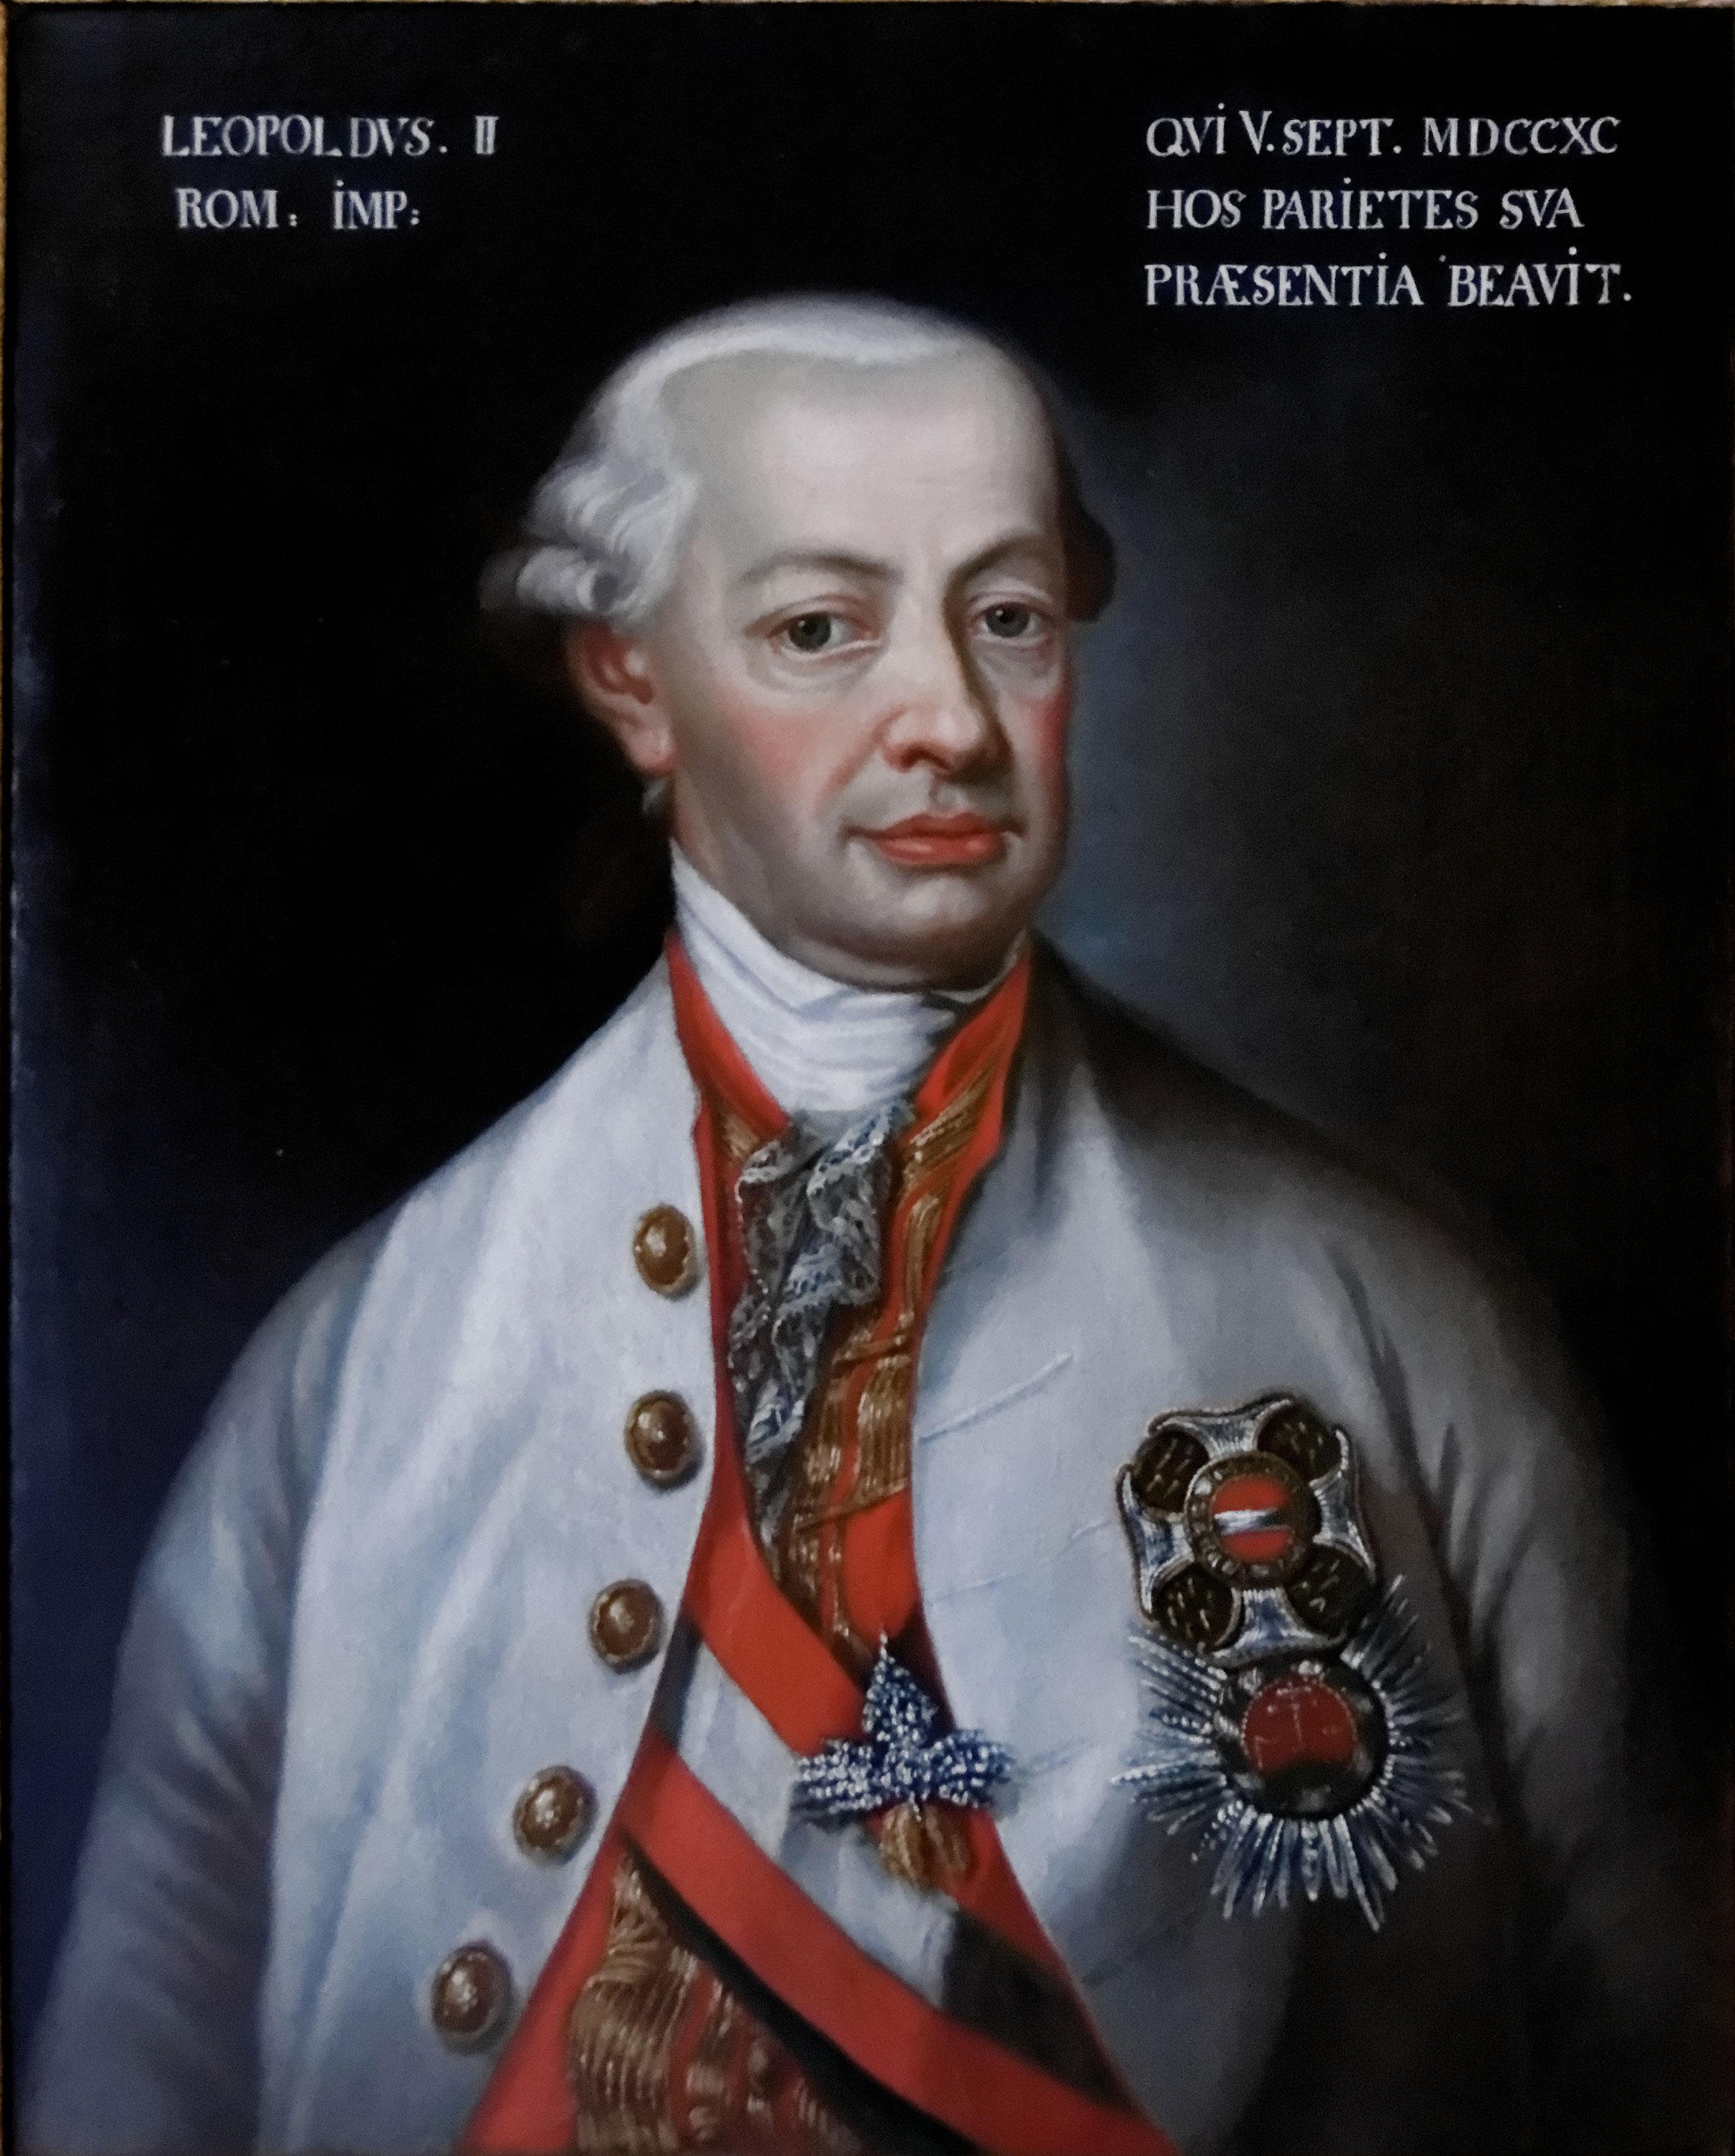 L'Empereur Leopold II, Anonyme, vers 1791-92 © Magyar Nemzeti Muzeum Budapest